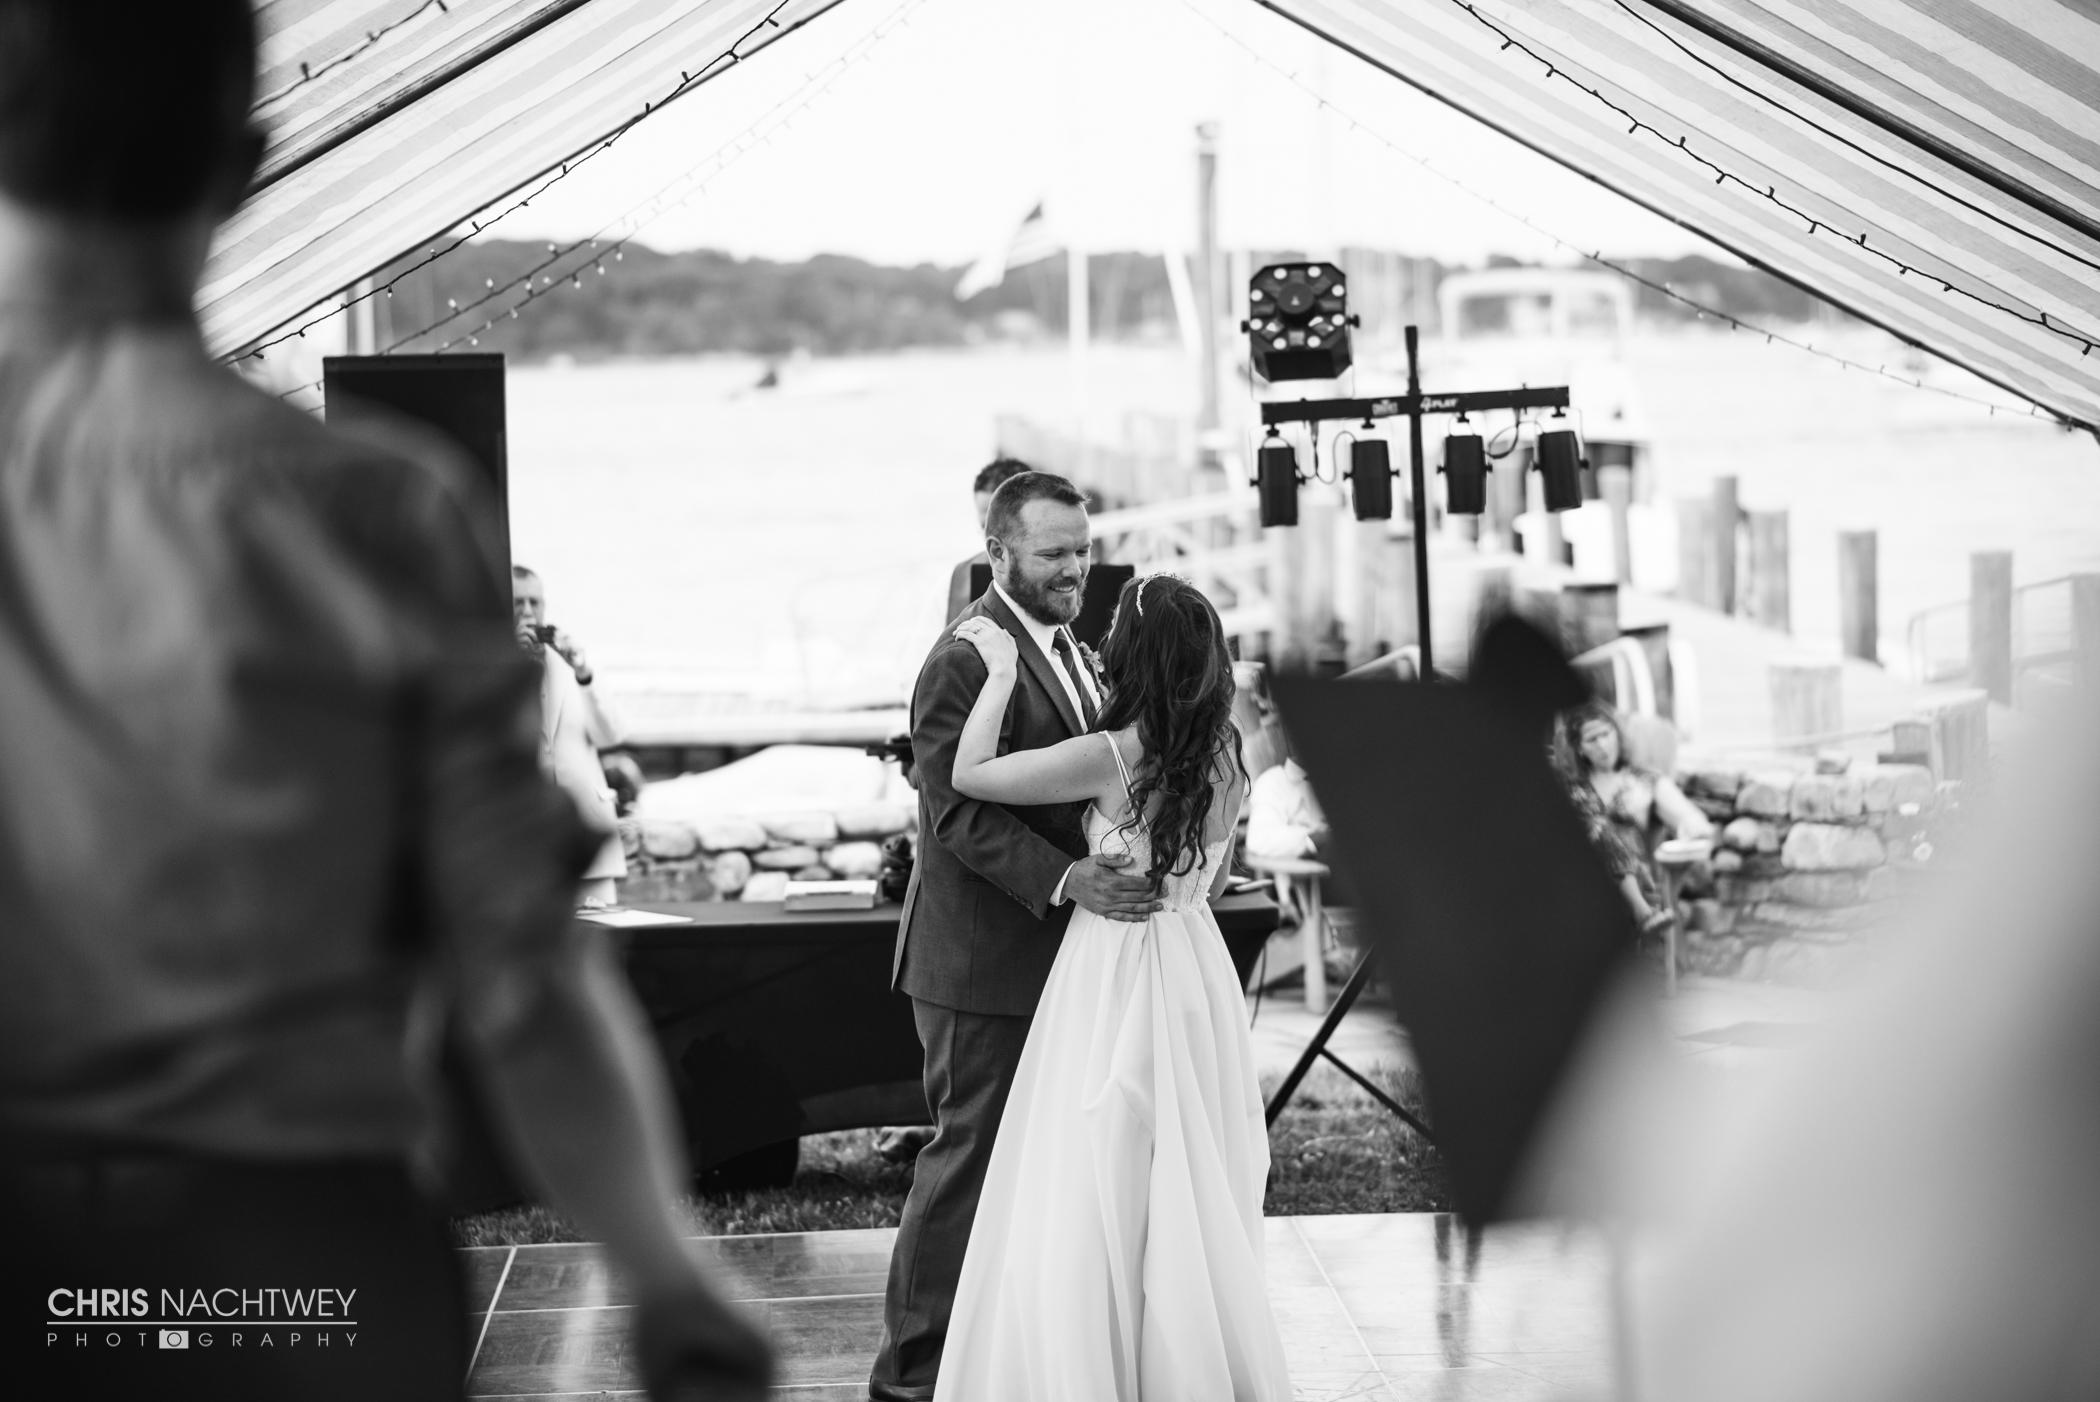 wedding-ram-island-yacht-club-noank-ct-chris-nachtwey-photography-2016.jpg